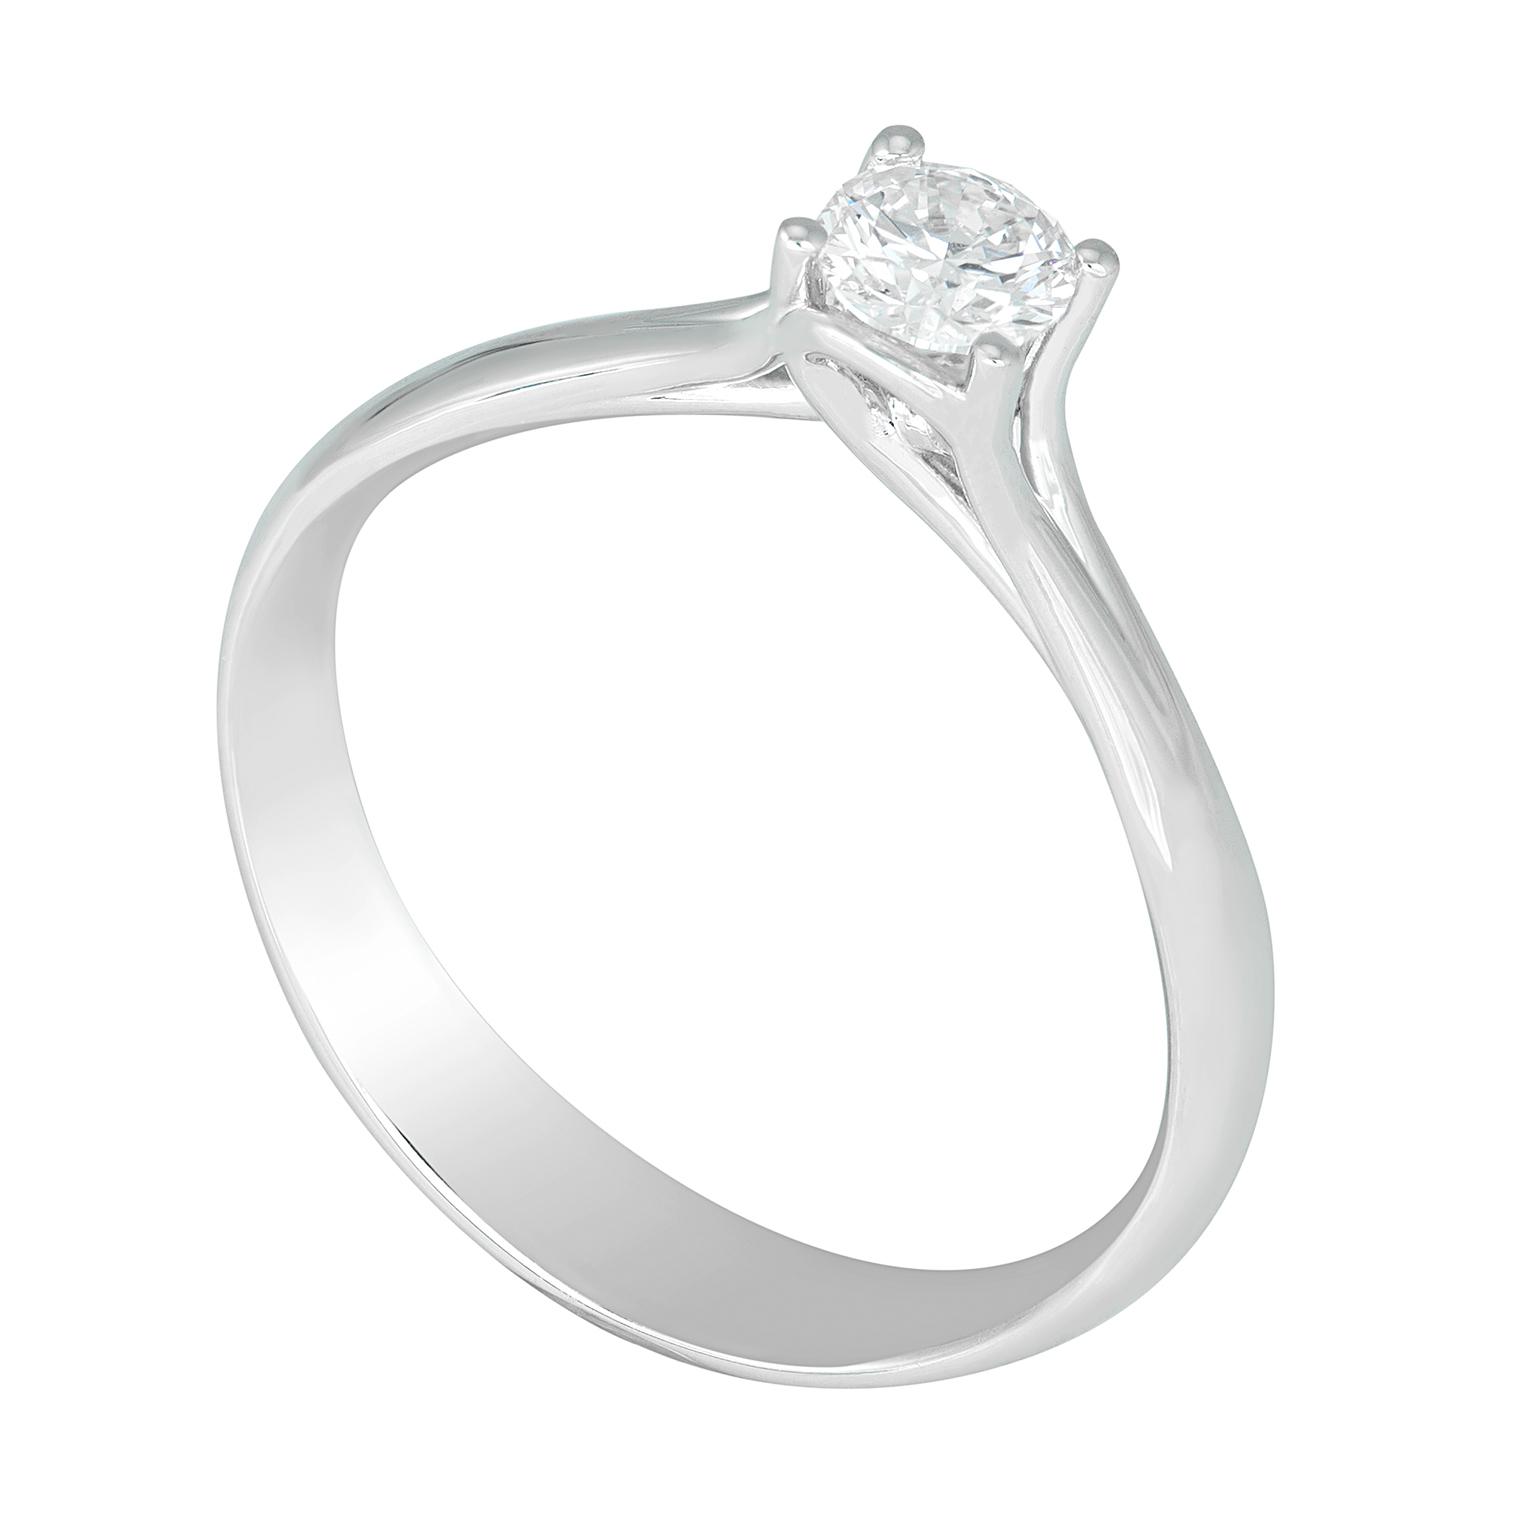 ANELLO SOLITARIO INFINITO, World Diamond Group